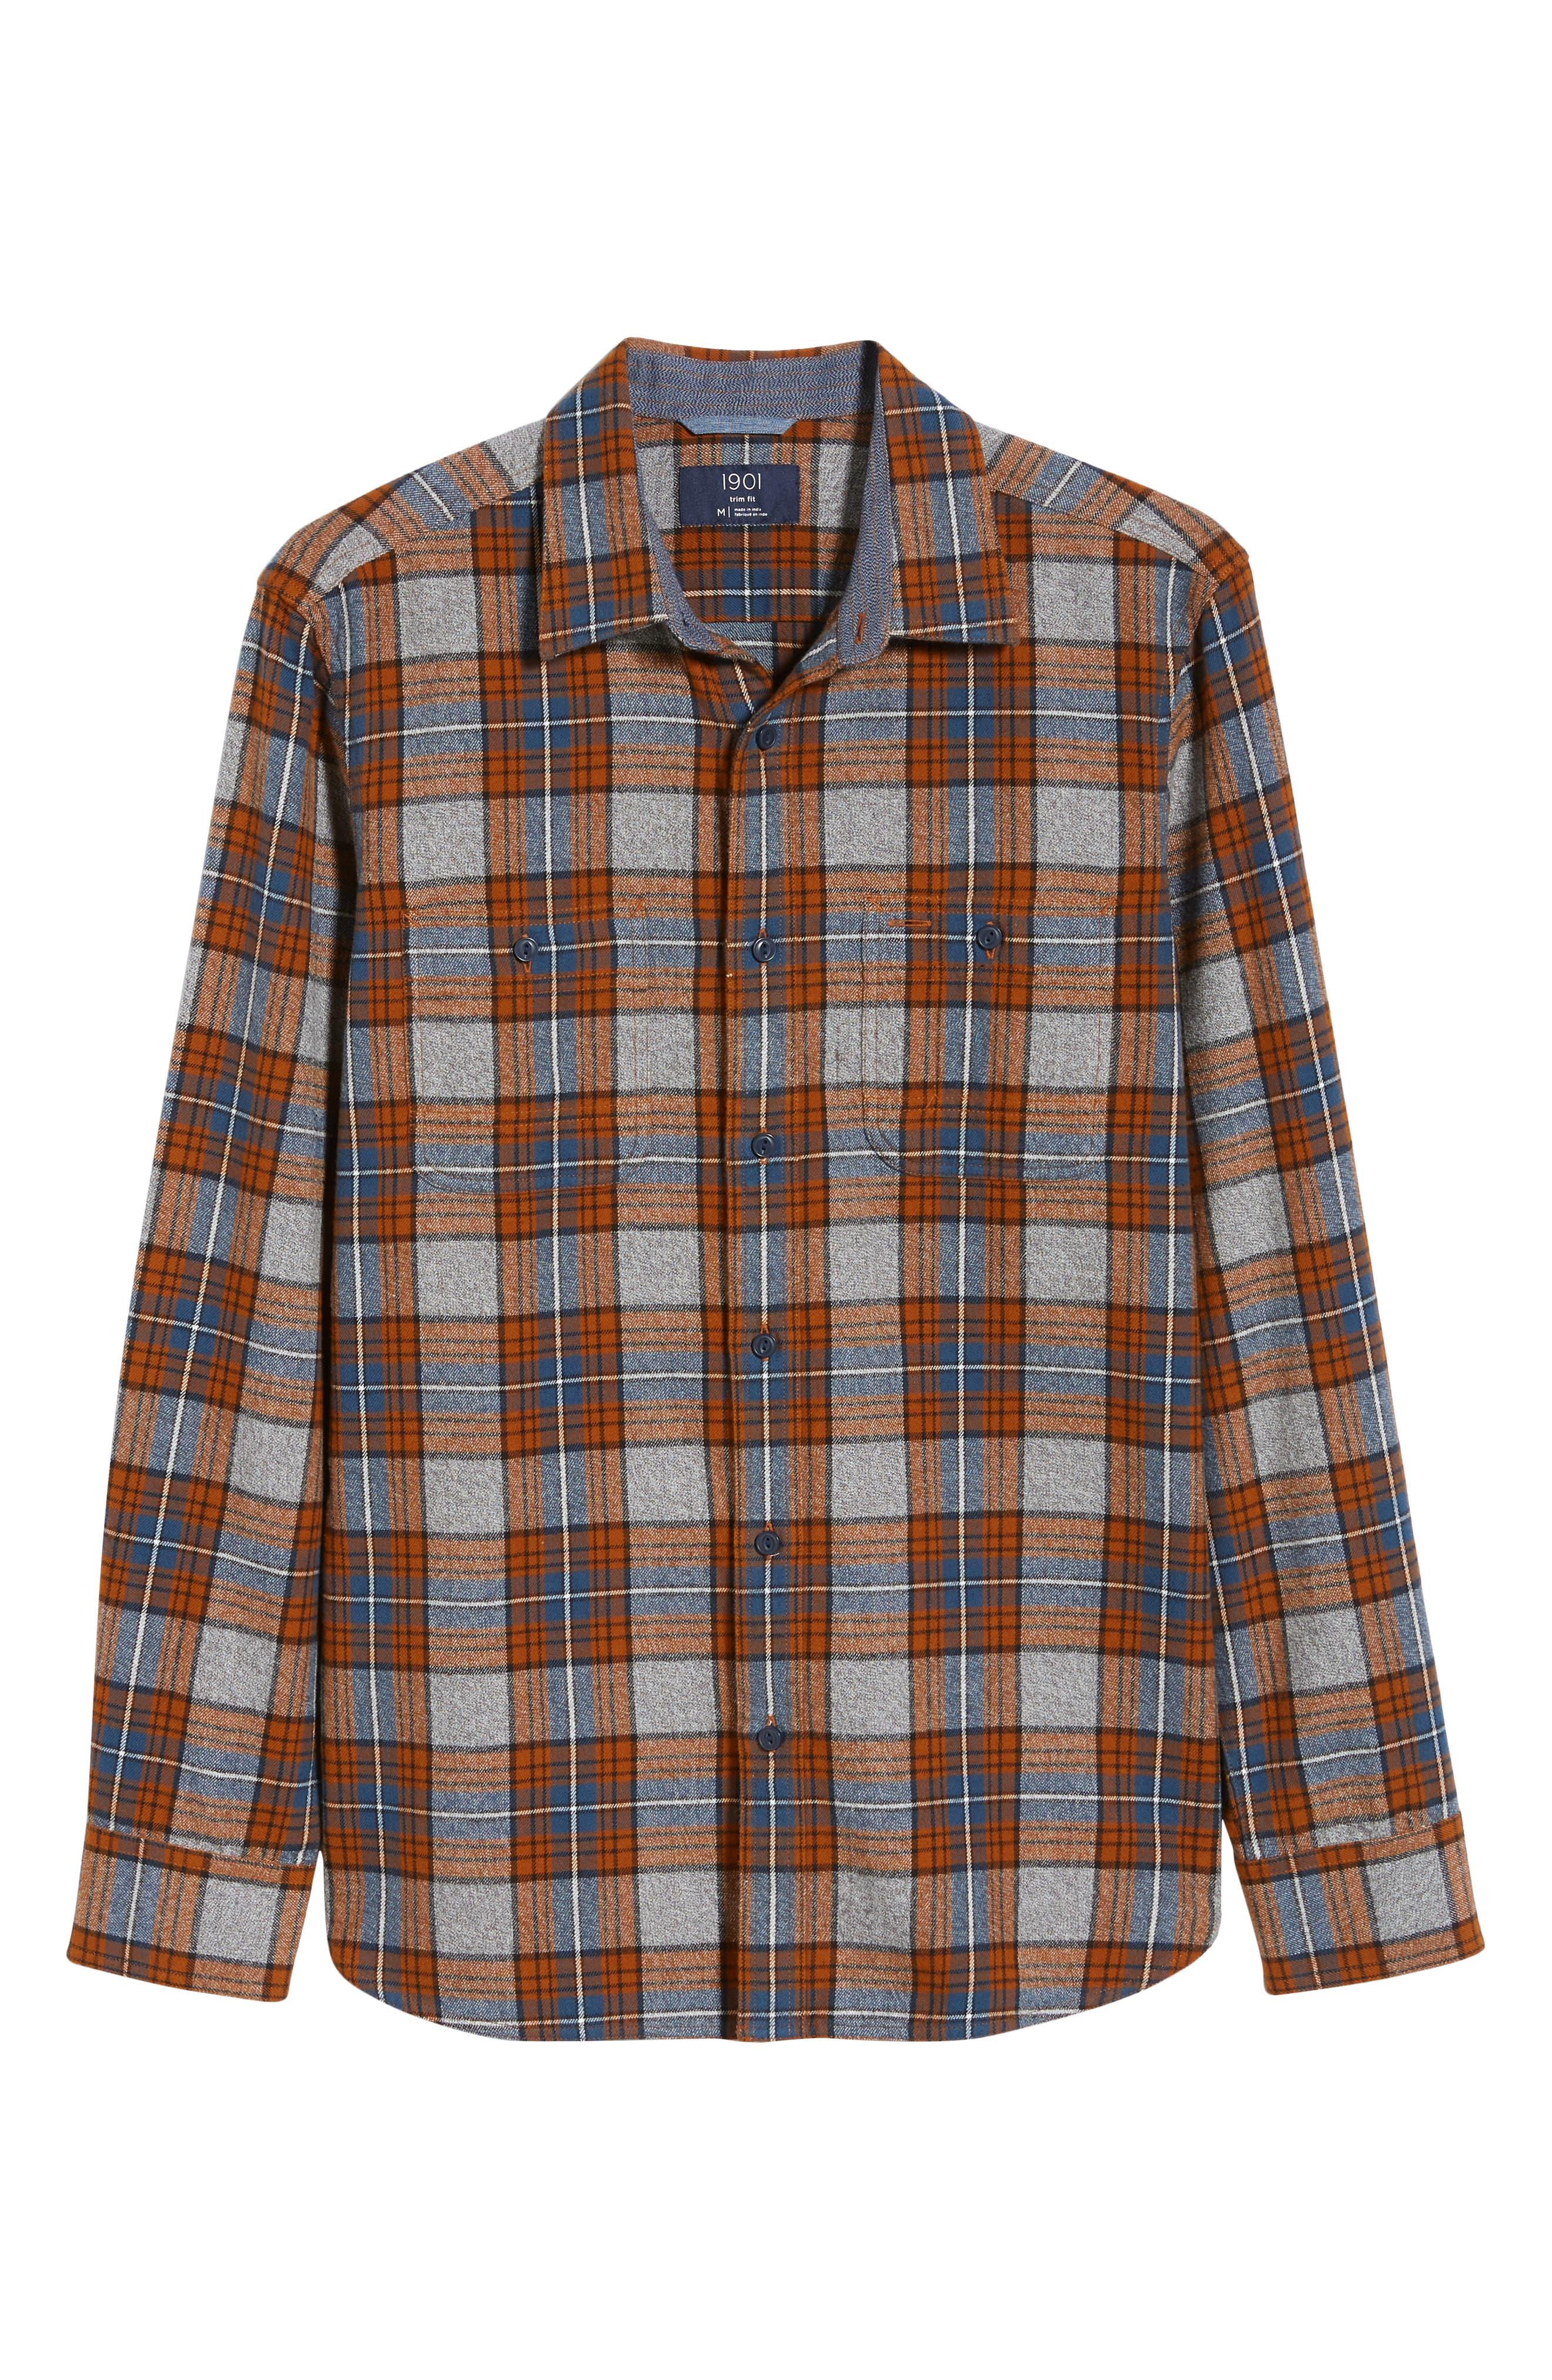 Regular Fit Workwear Plaid Flannel Shirt,                             Alternate thumbnail 6, color,                             RUST AUTUMN BLUE PLAID